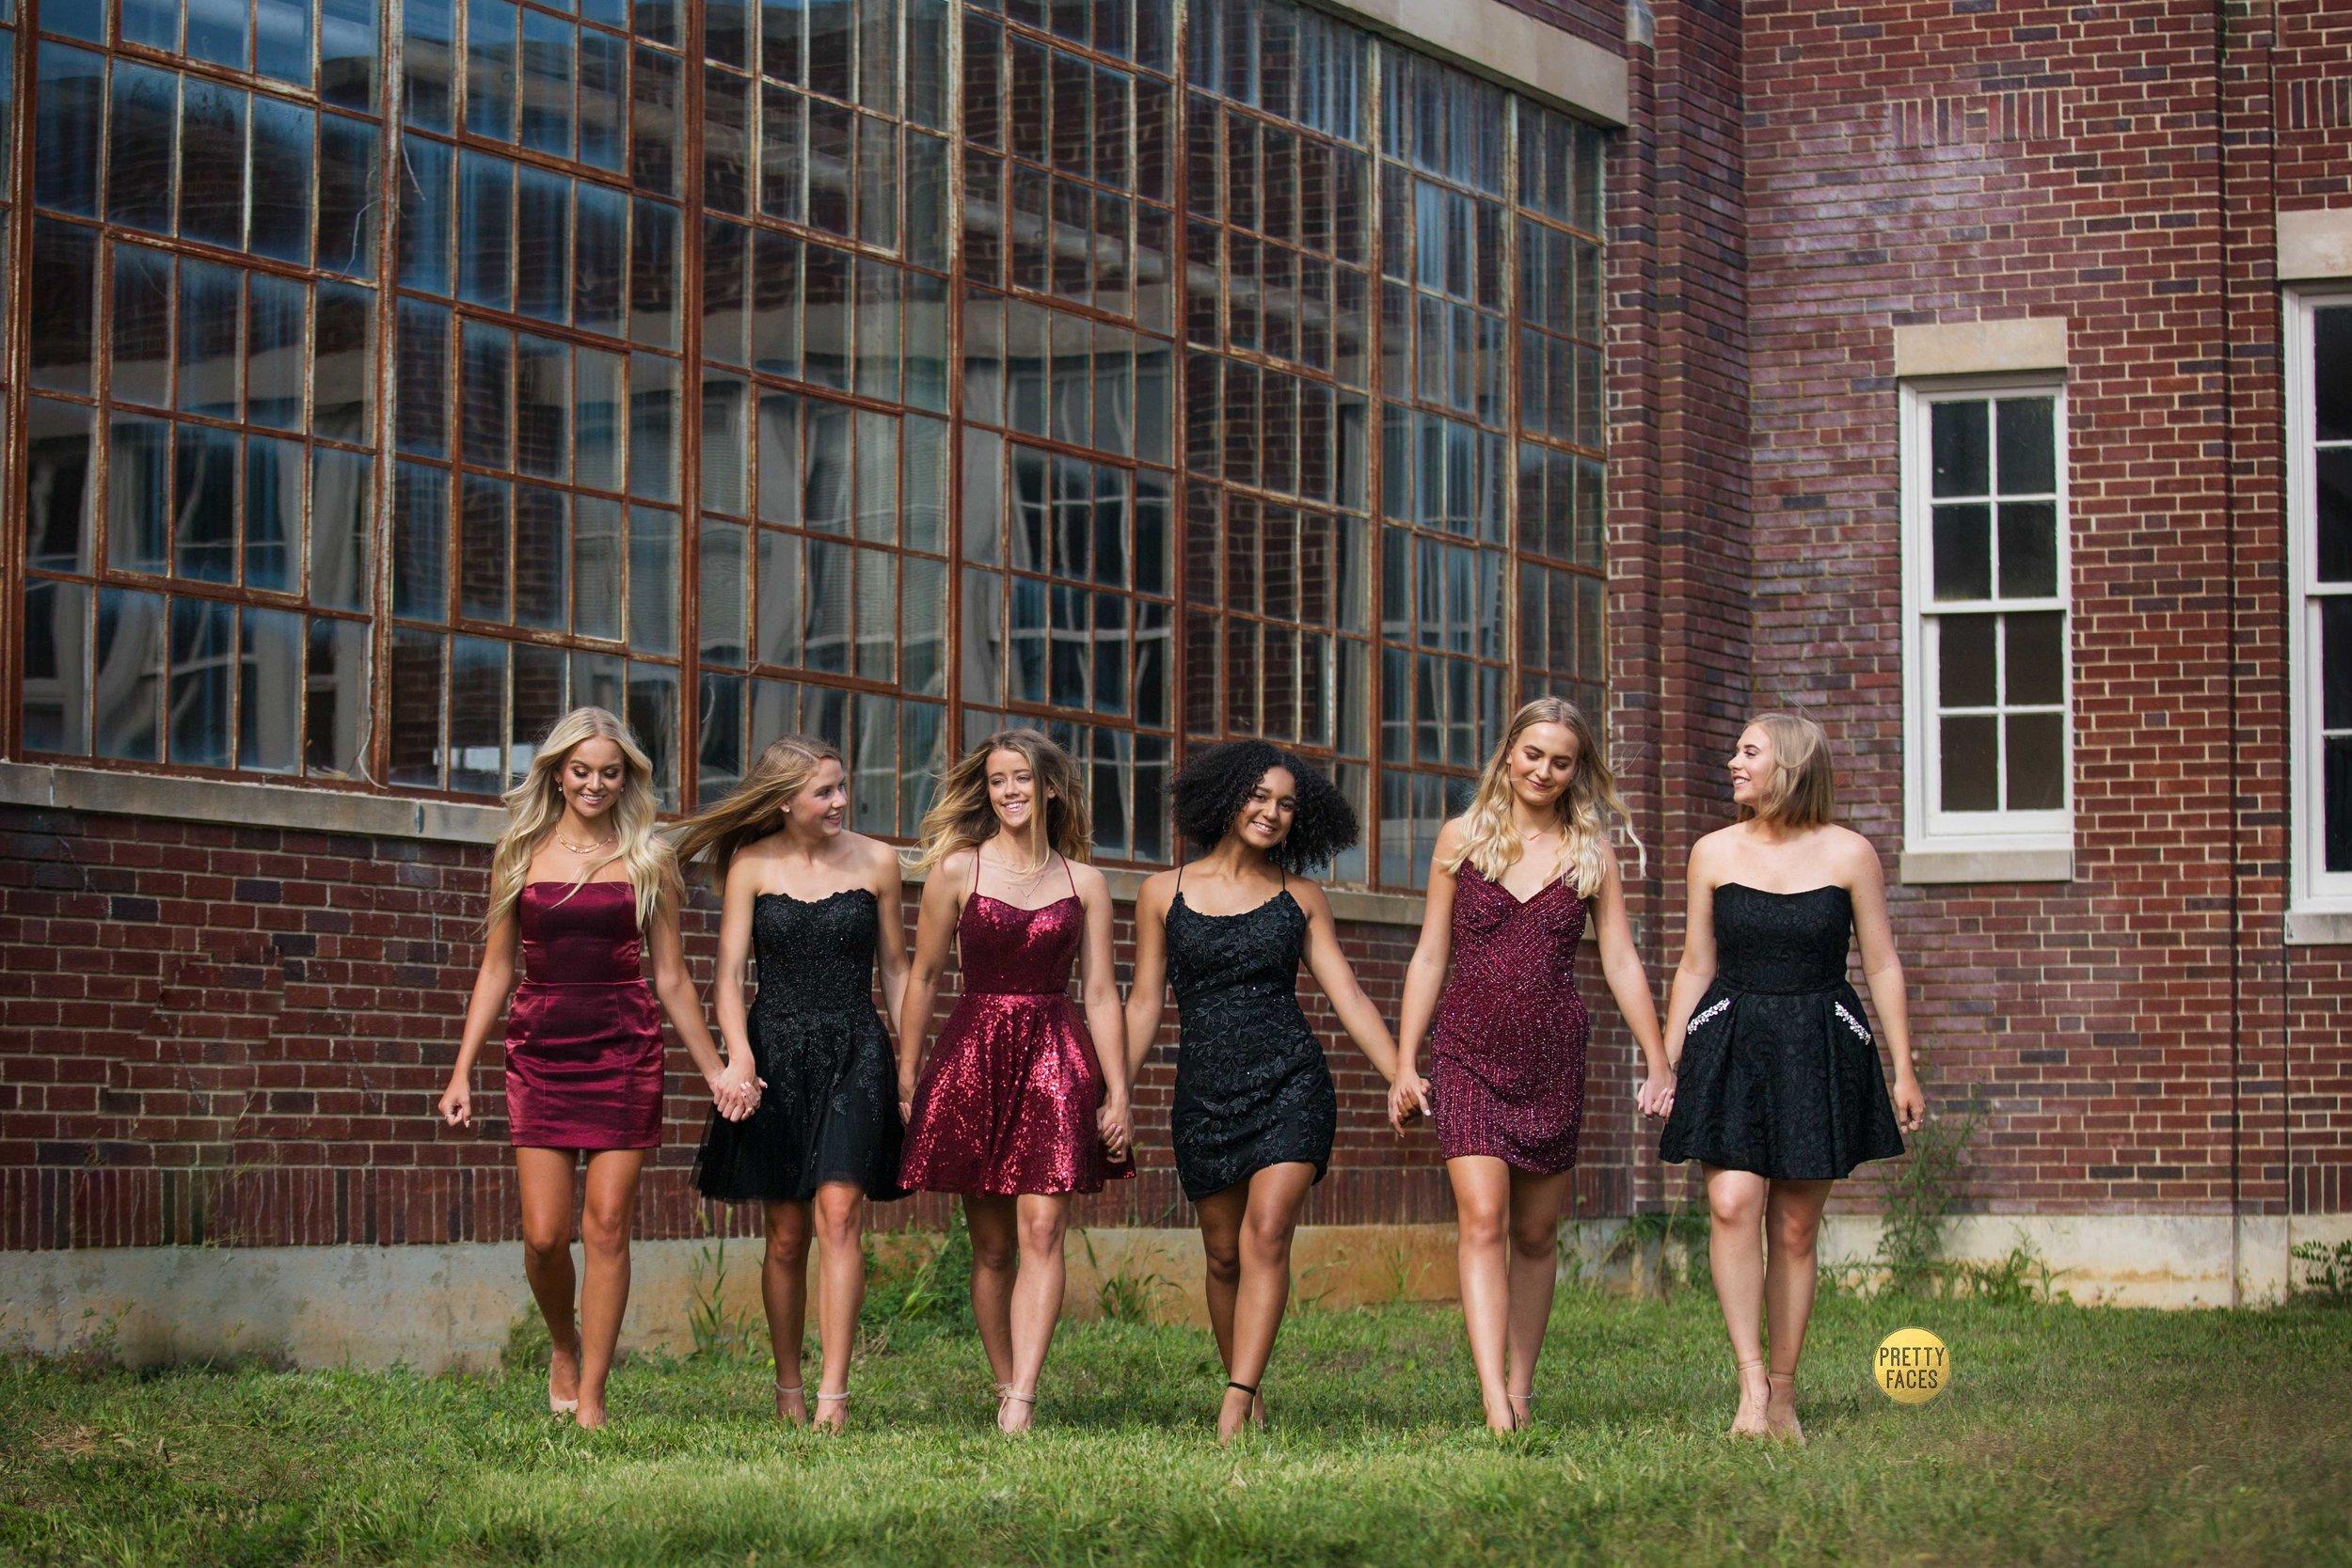 Pretty Team 20's Homecoming Photo Shoot, featuring Sherri Hill dresses from J & B Bridal